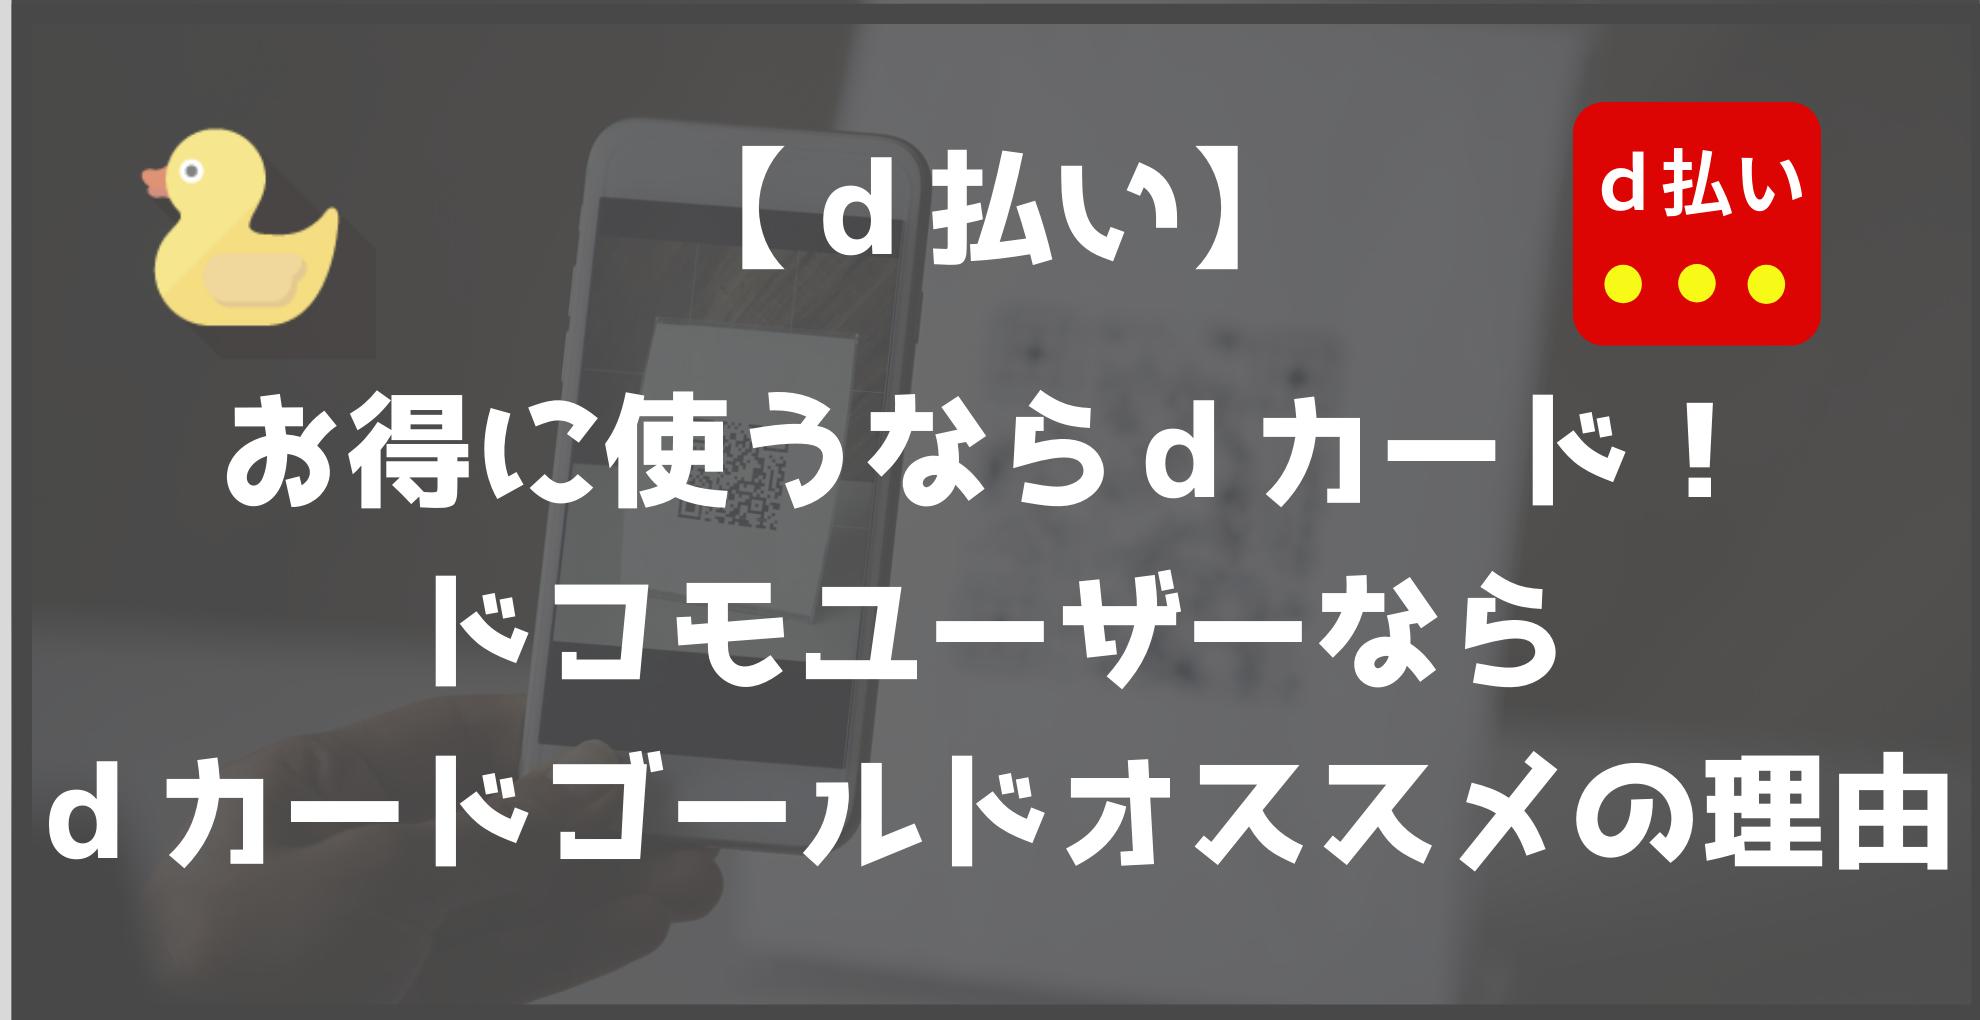 【d払い】お得に使うならdカード! ドコモユーザーならdカード GOLDが絶対にオススメ